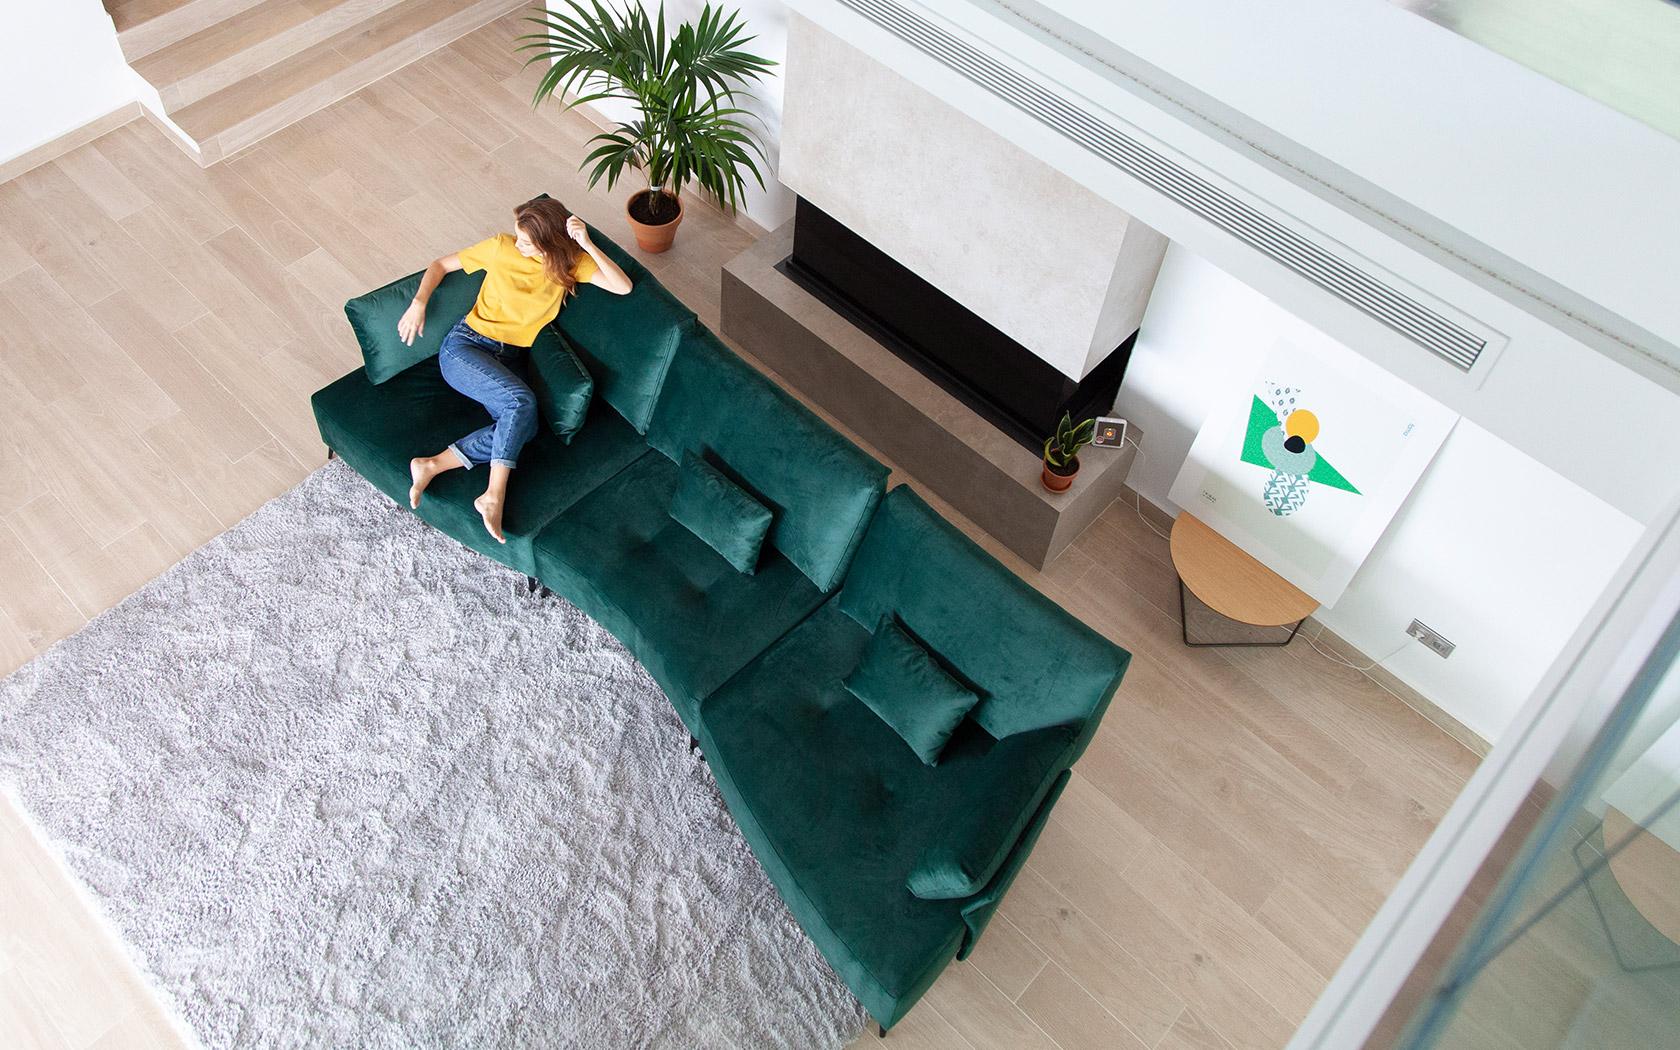 kalahari sofa 2021 13